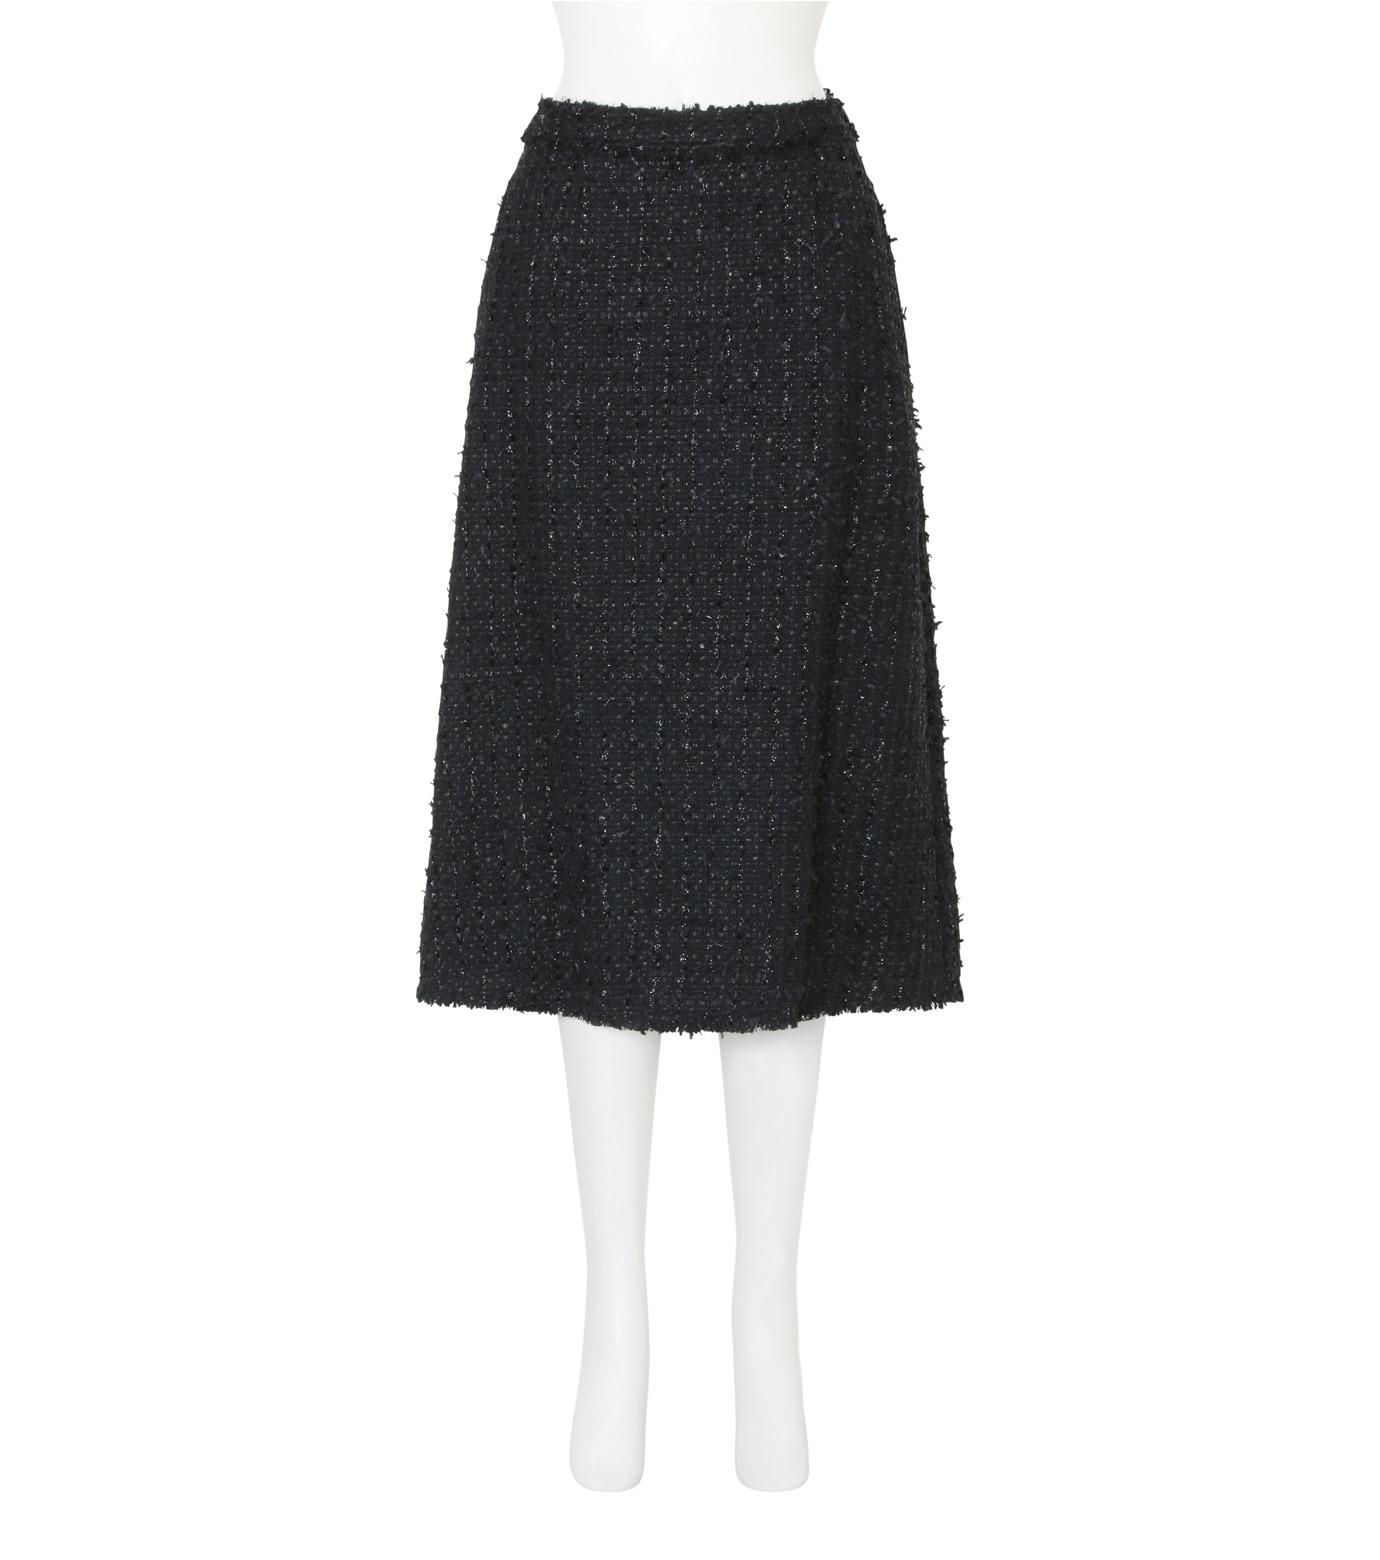 Simone Rocha(シモーネロシャ)のFine Tweed Skirt-BLACK(スカート/skirt)-3359-13 拡大詳細画像1